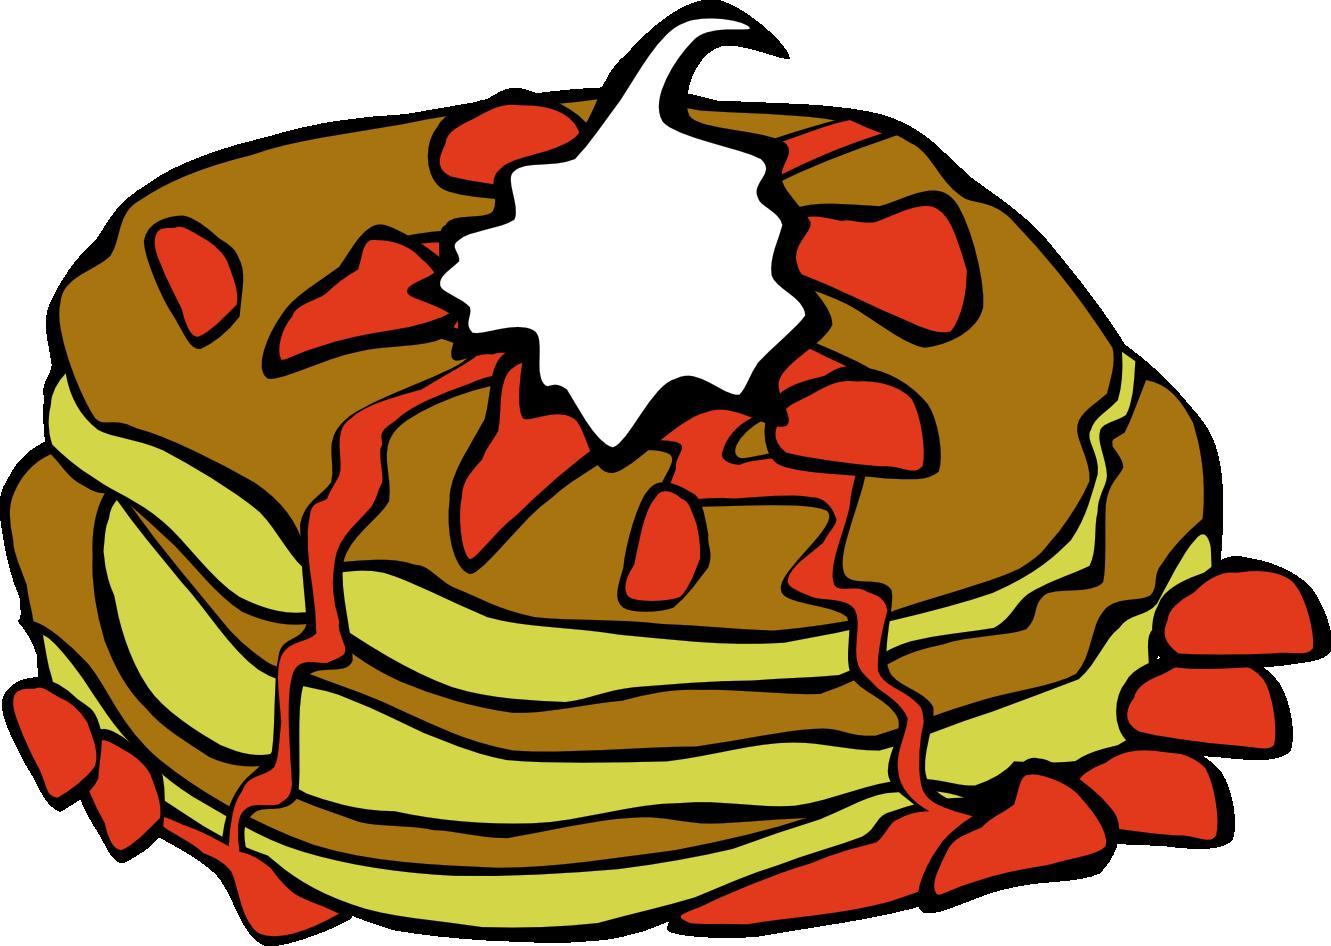 Free breakfast food cliparts. Foods clipart cartoon